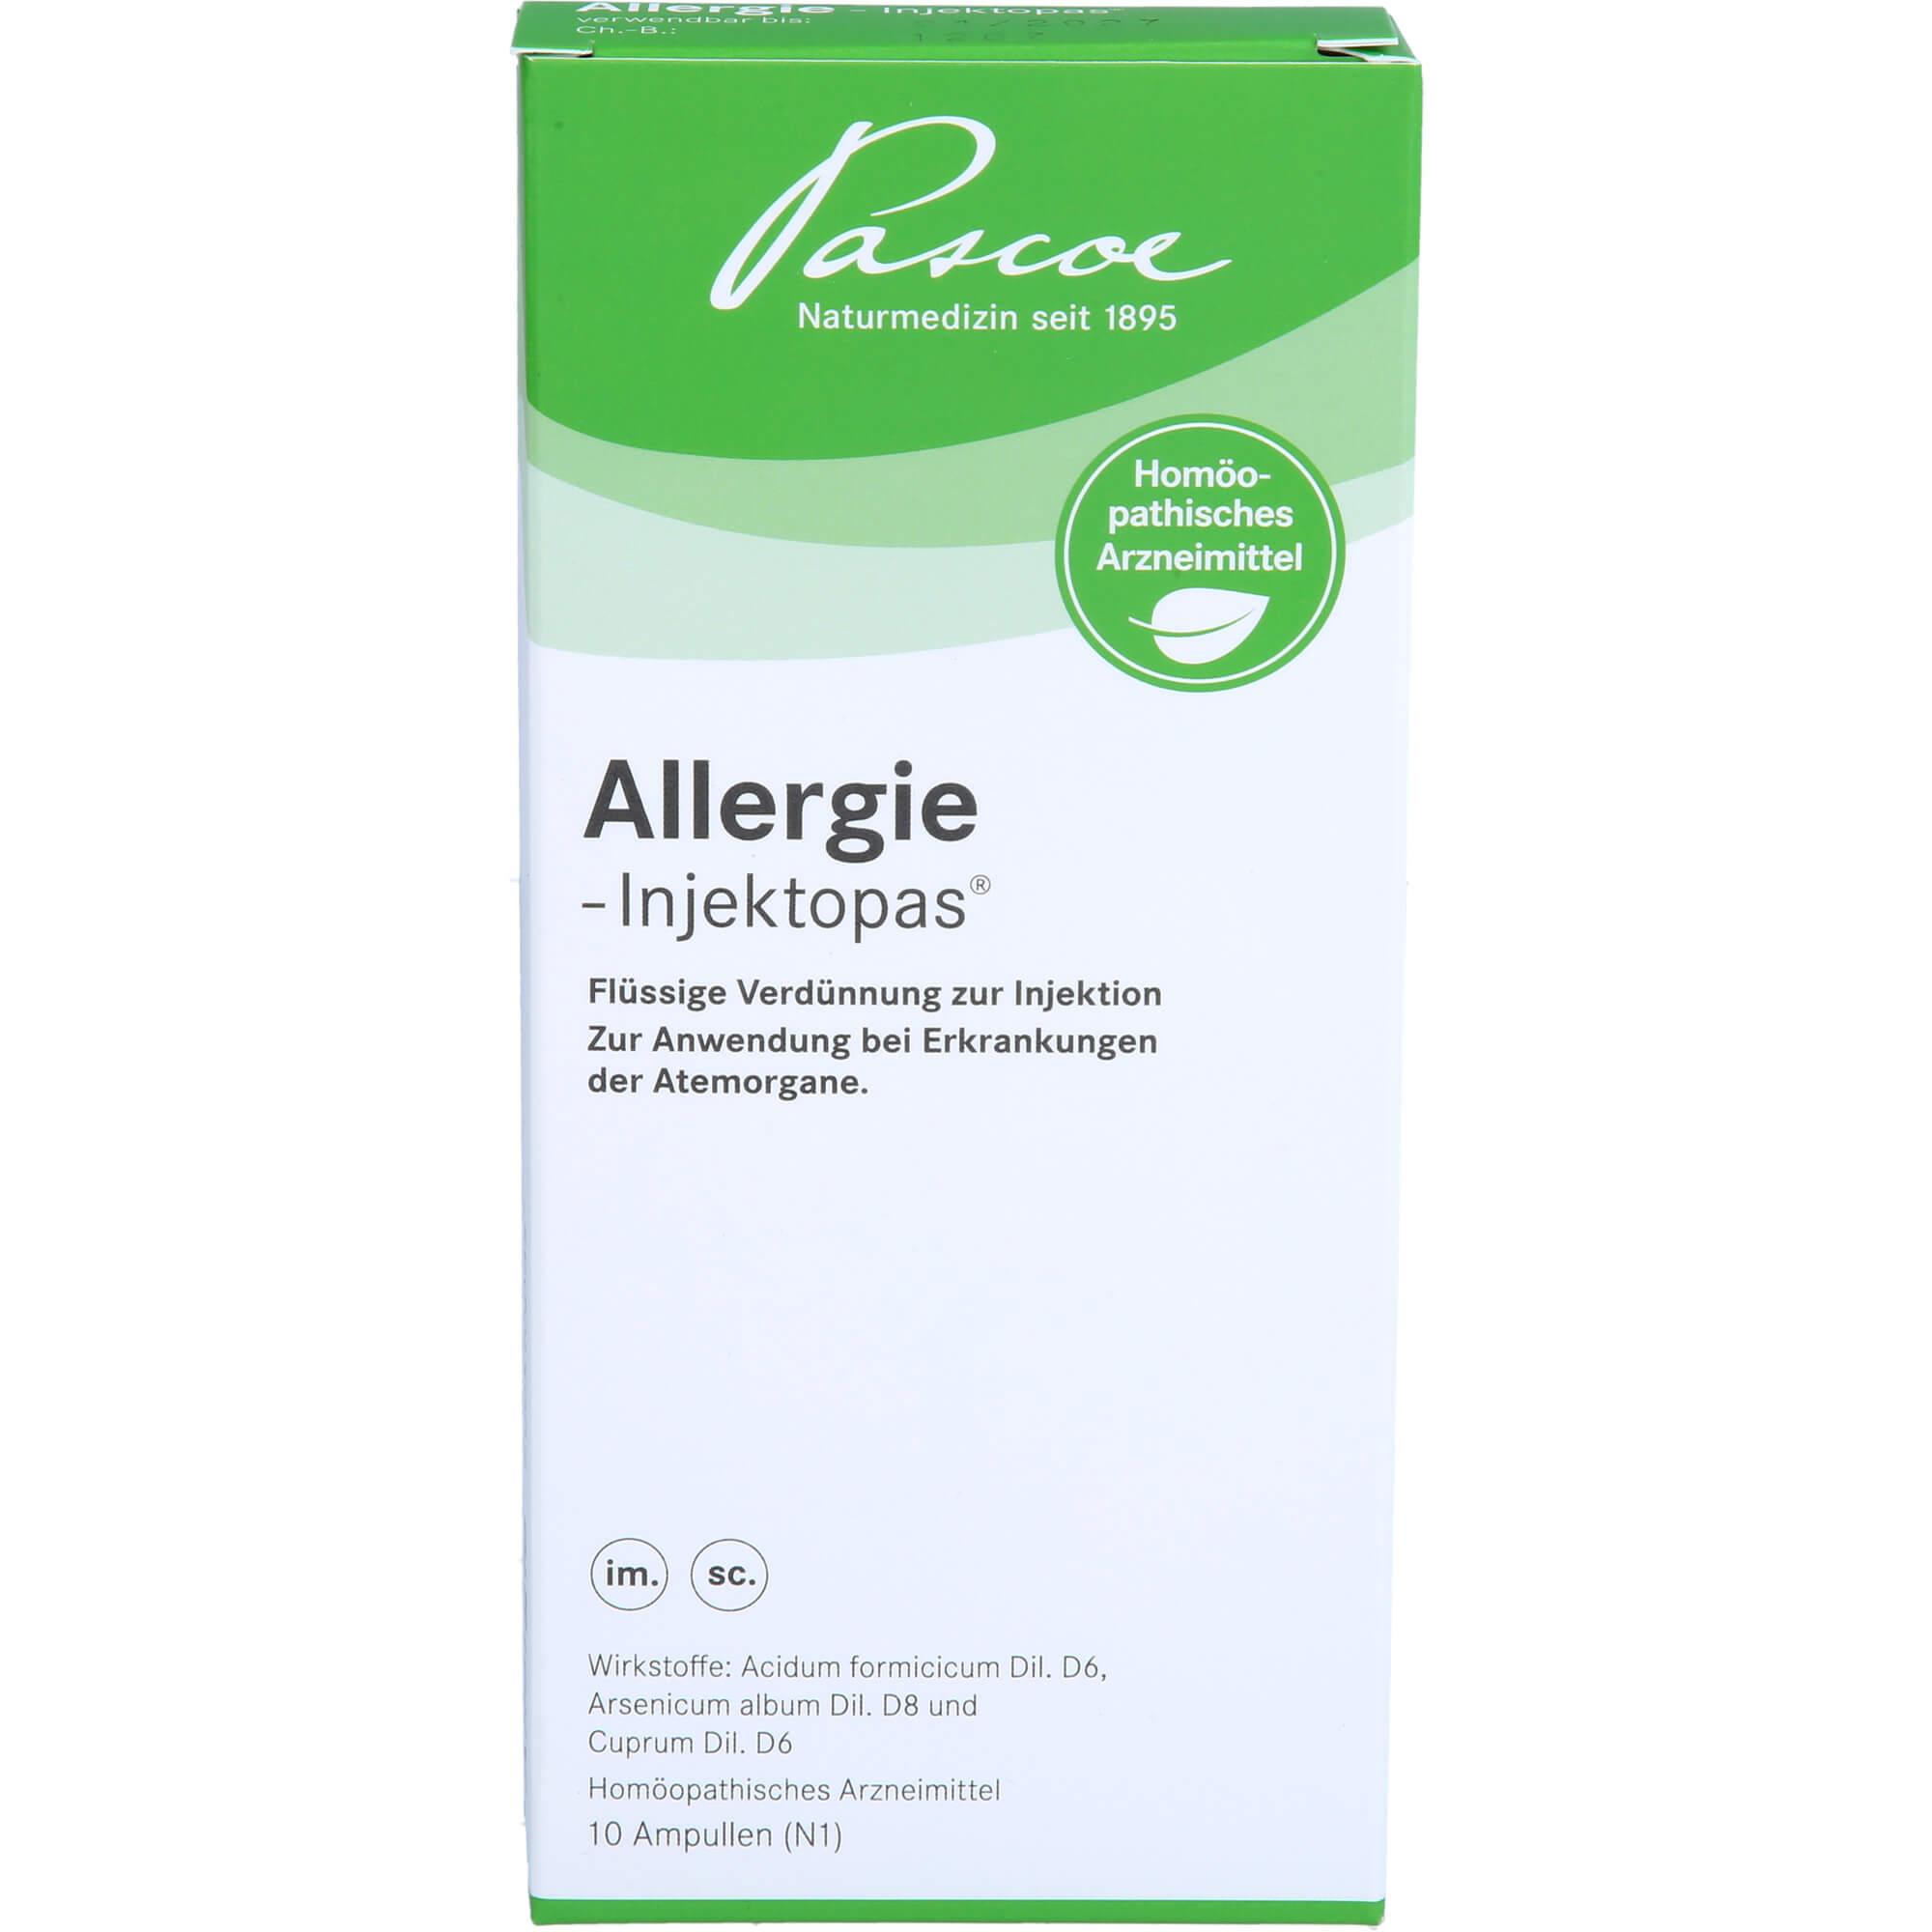 ALLERGIE-INJEKTOPAS-Injektionsloesung-Ampullen